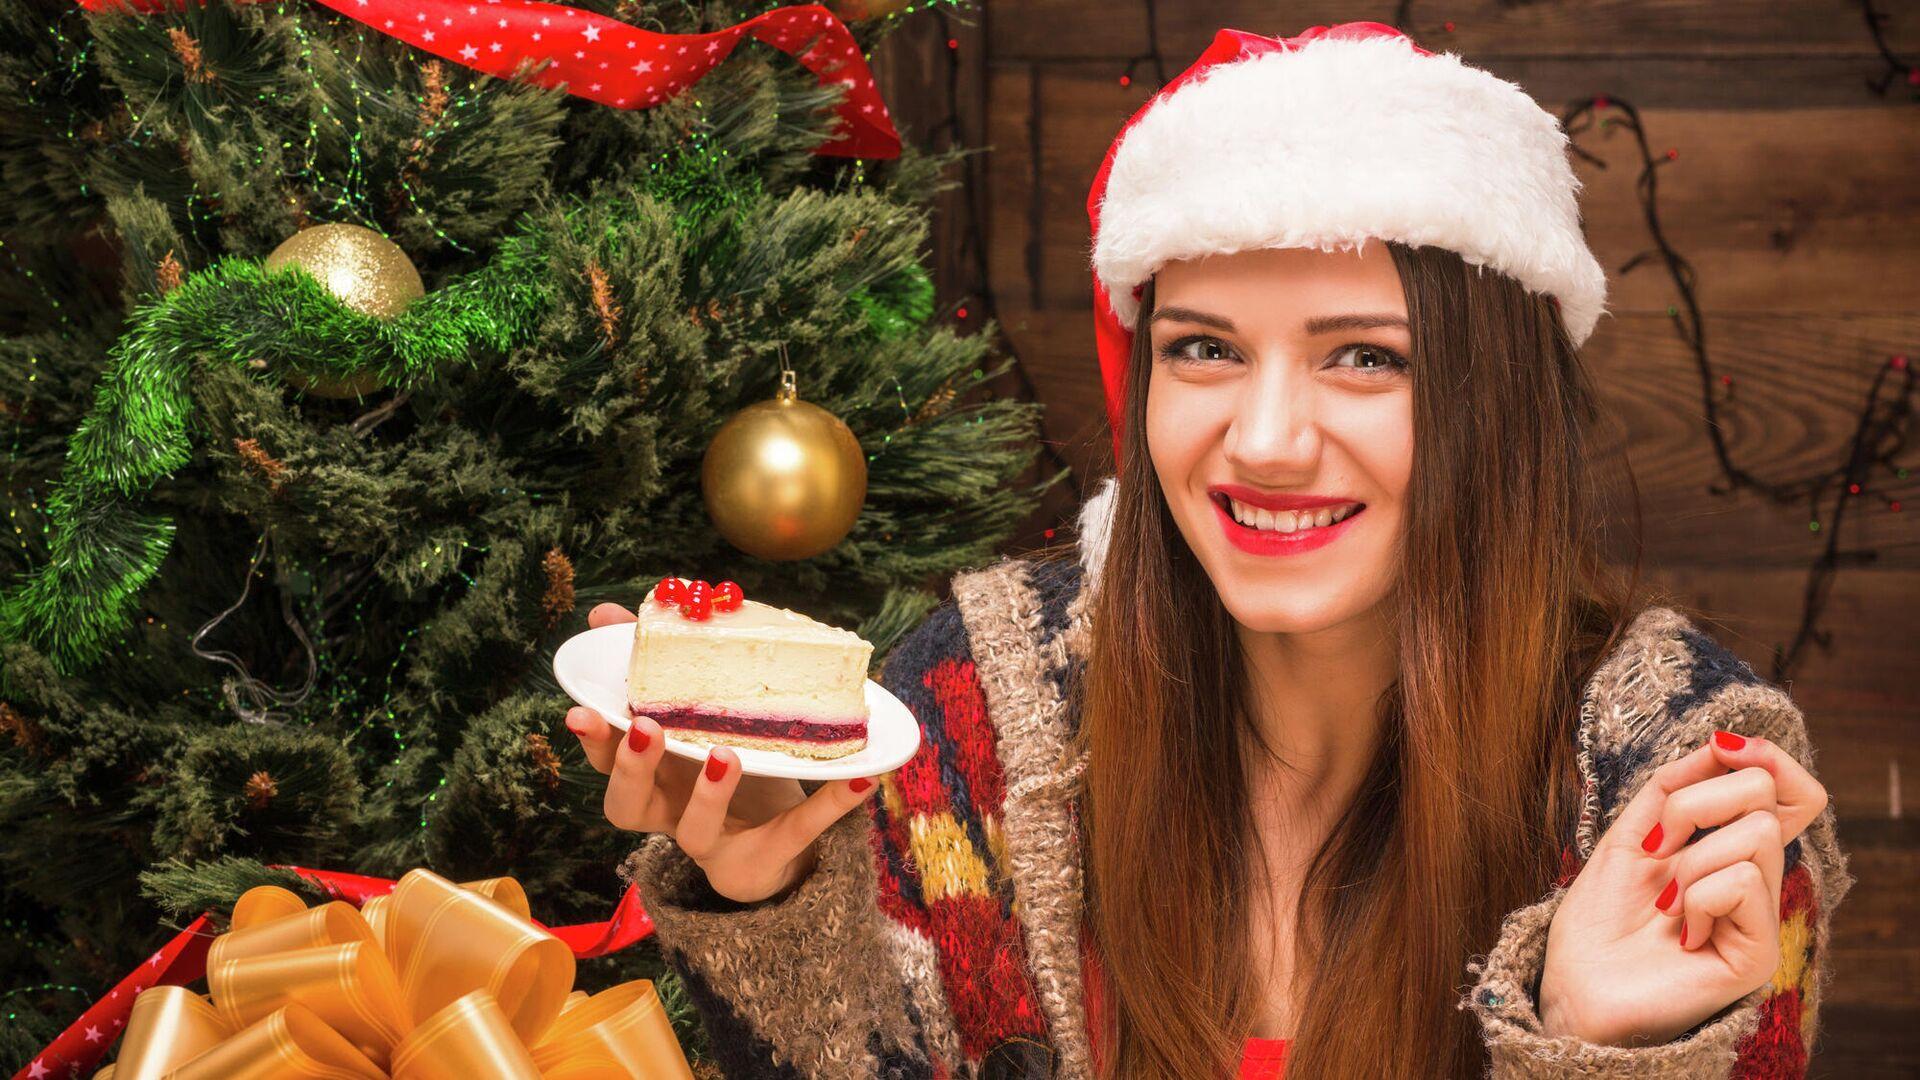 Девушка с кусочком торта - РИА Новости, 1920, 05.01.2020